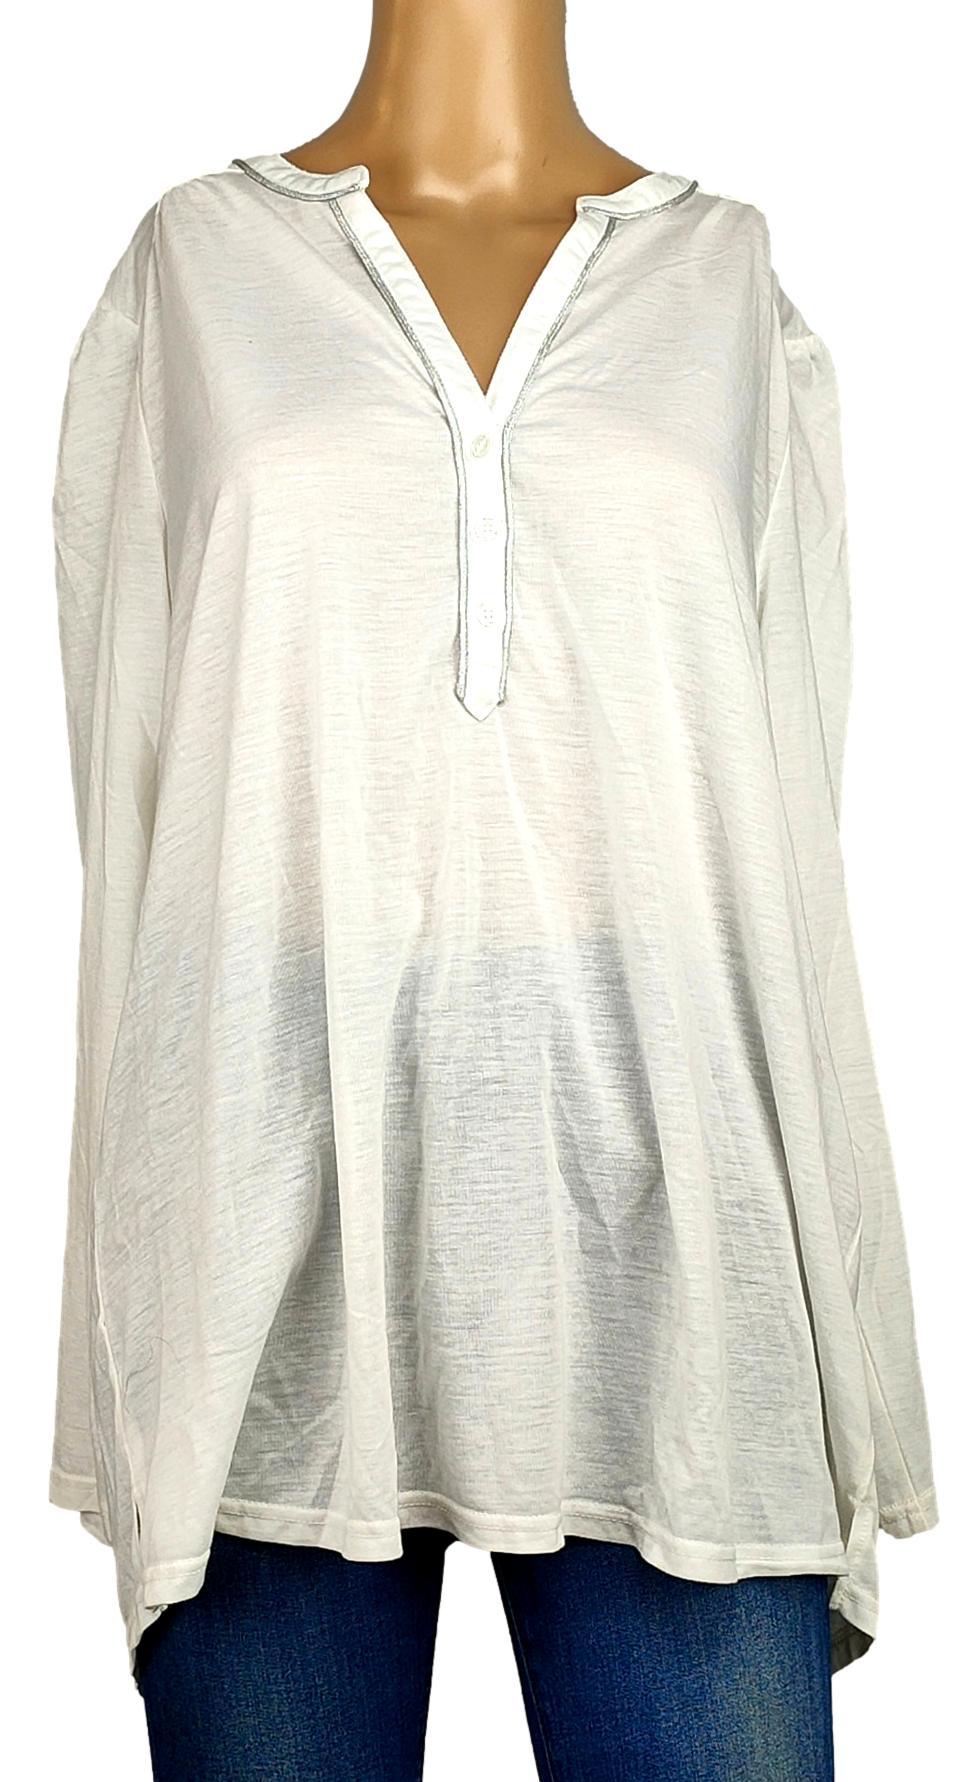 T-Shirt Gemo - Taille XL